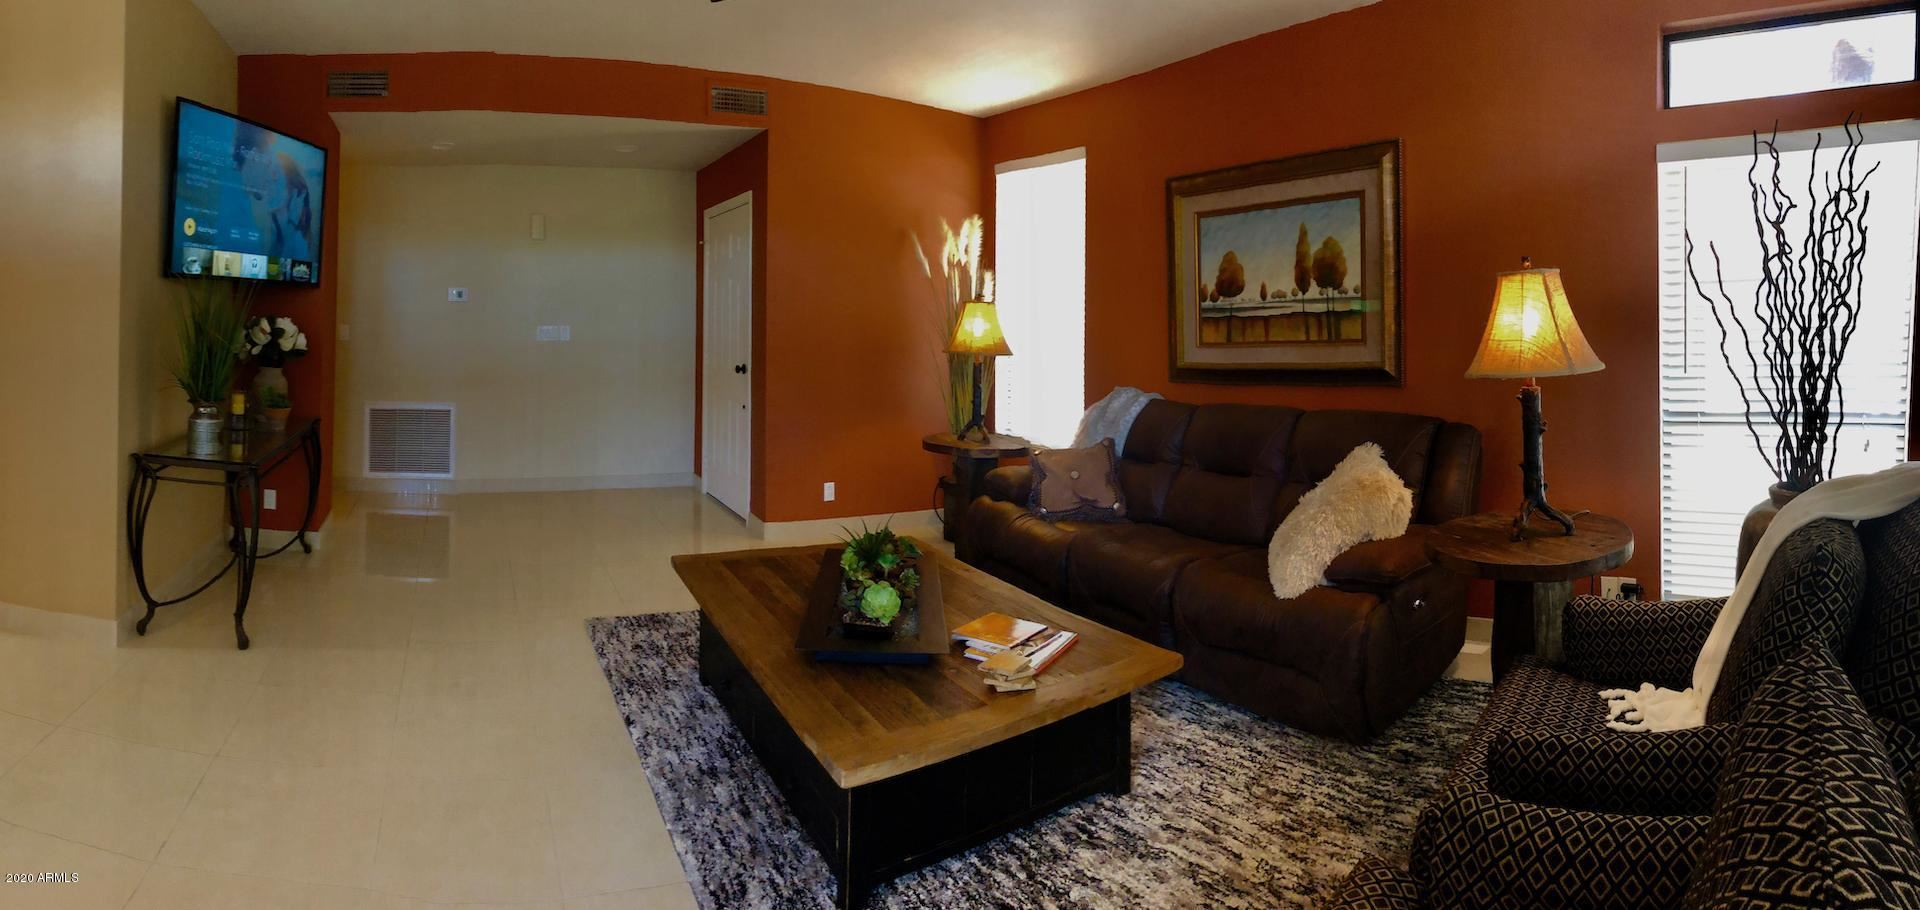 9707 E MOUNTAIN VIEW Road #1416, Scottsdale, AZ 85258 - MLS#: 6092361